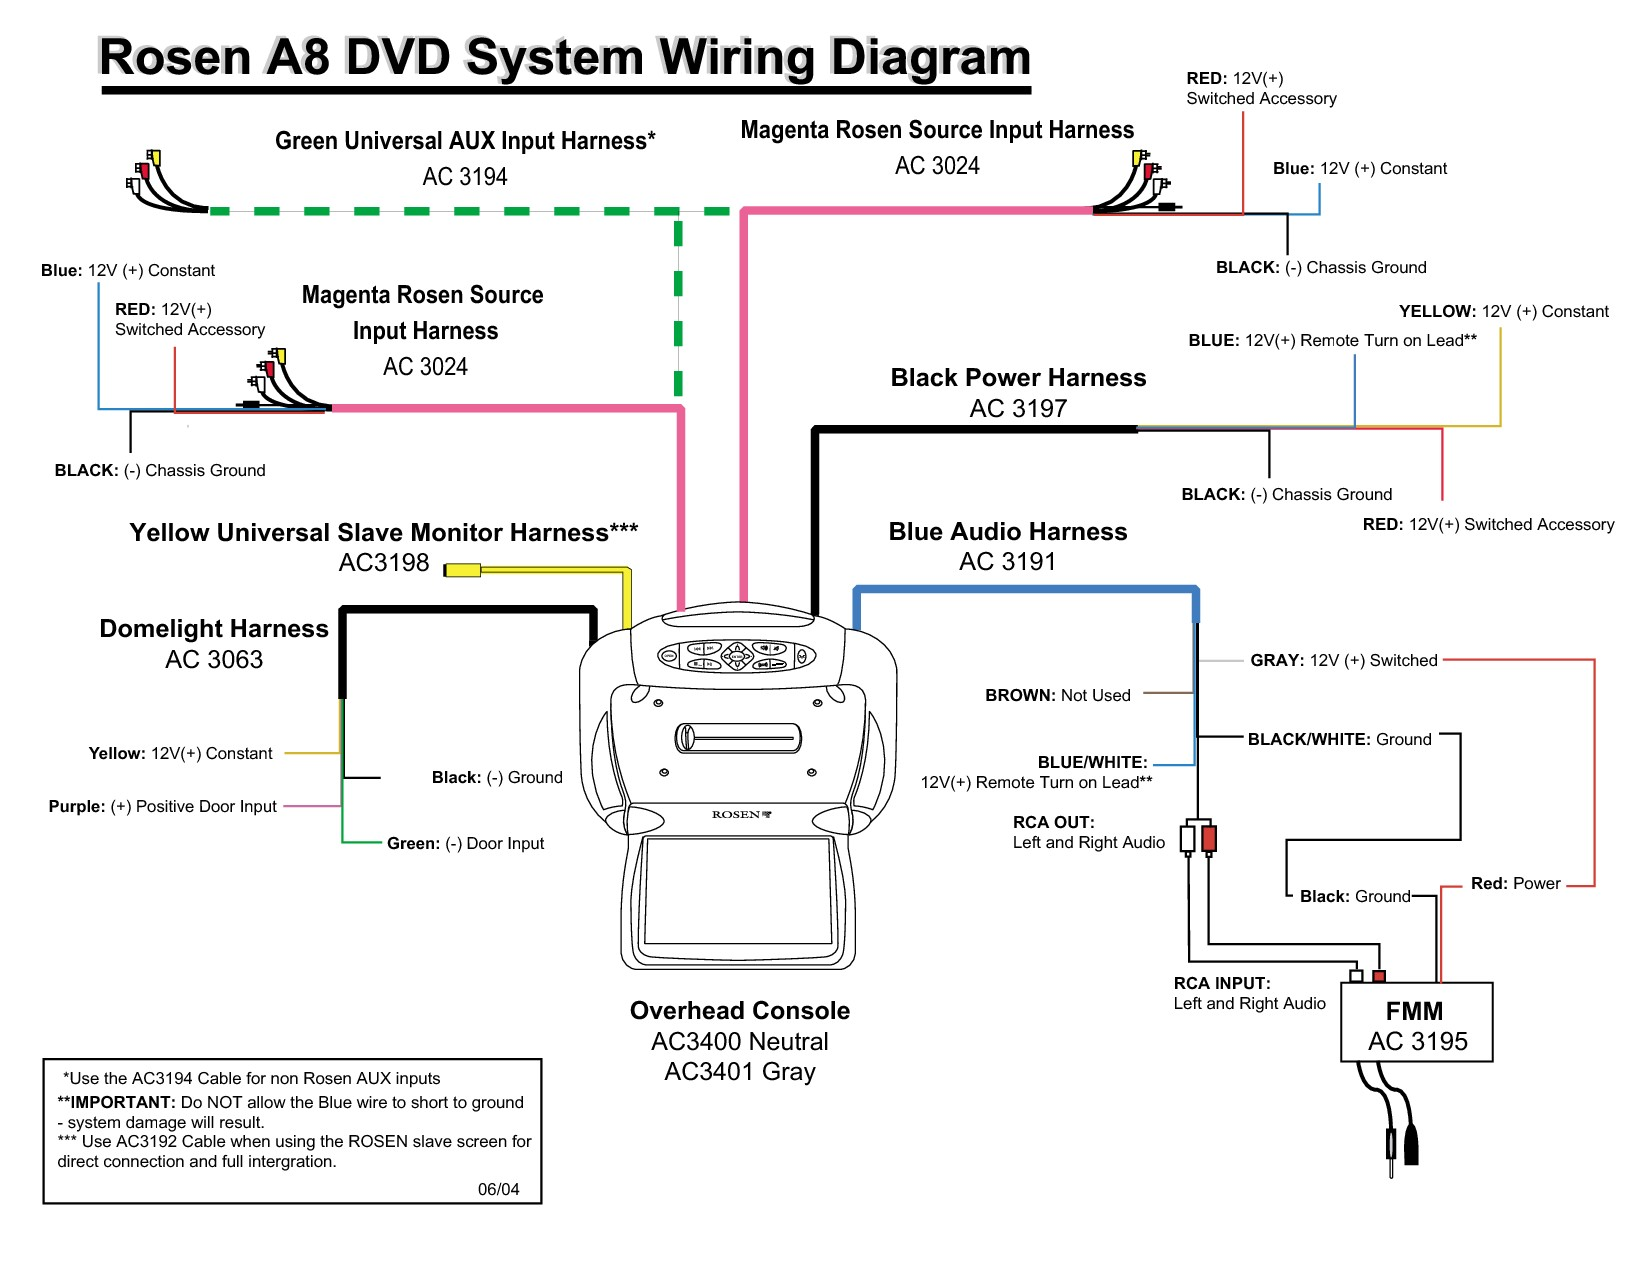 Viper 5701 Wiring Diagram FULL HD Version Wiring Diagram - CIRCLE-SPOKE- DIAGRAM.EMBALLAGES-SOUS-VIDE.FREMBALLAGES-SOUS-VIDE.FR